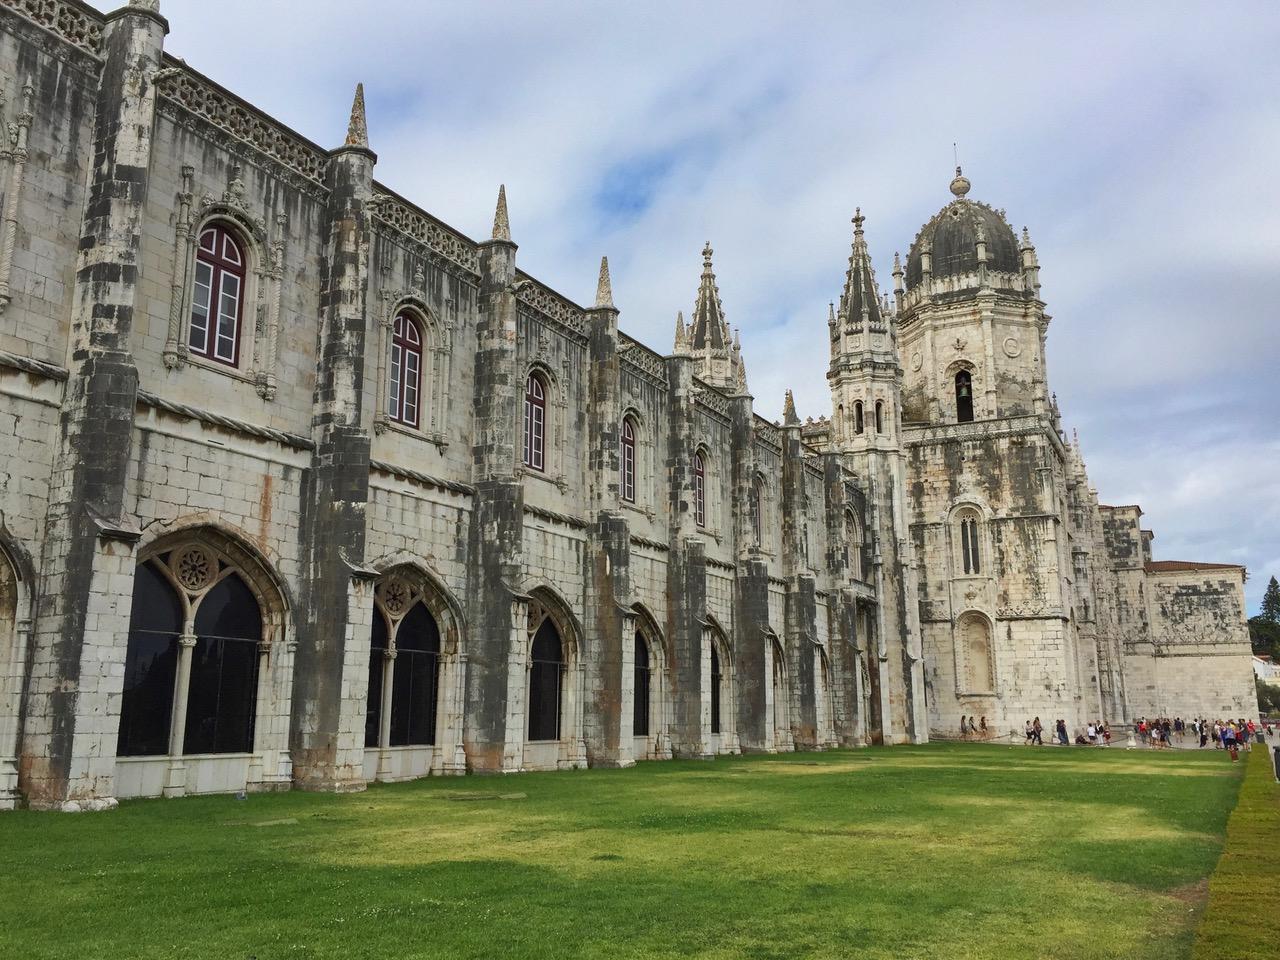 Mosteiro dos Jerónimos in Belém, Lisbon